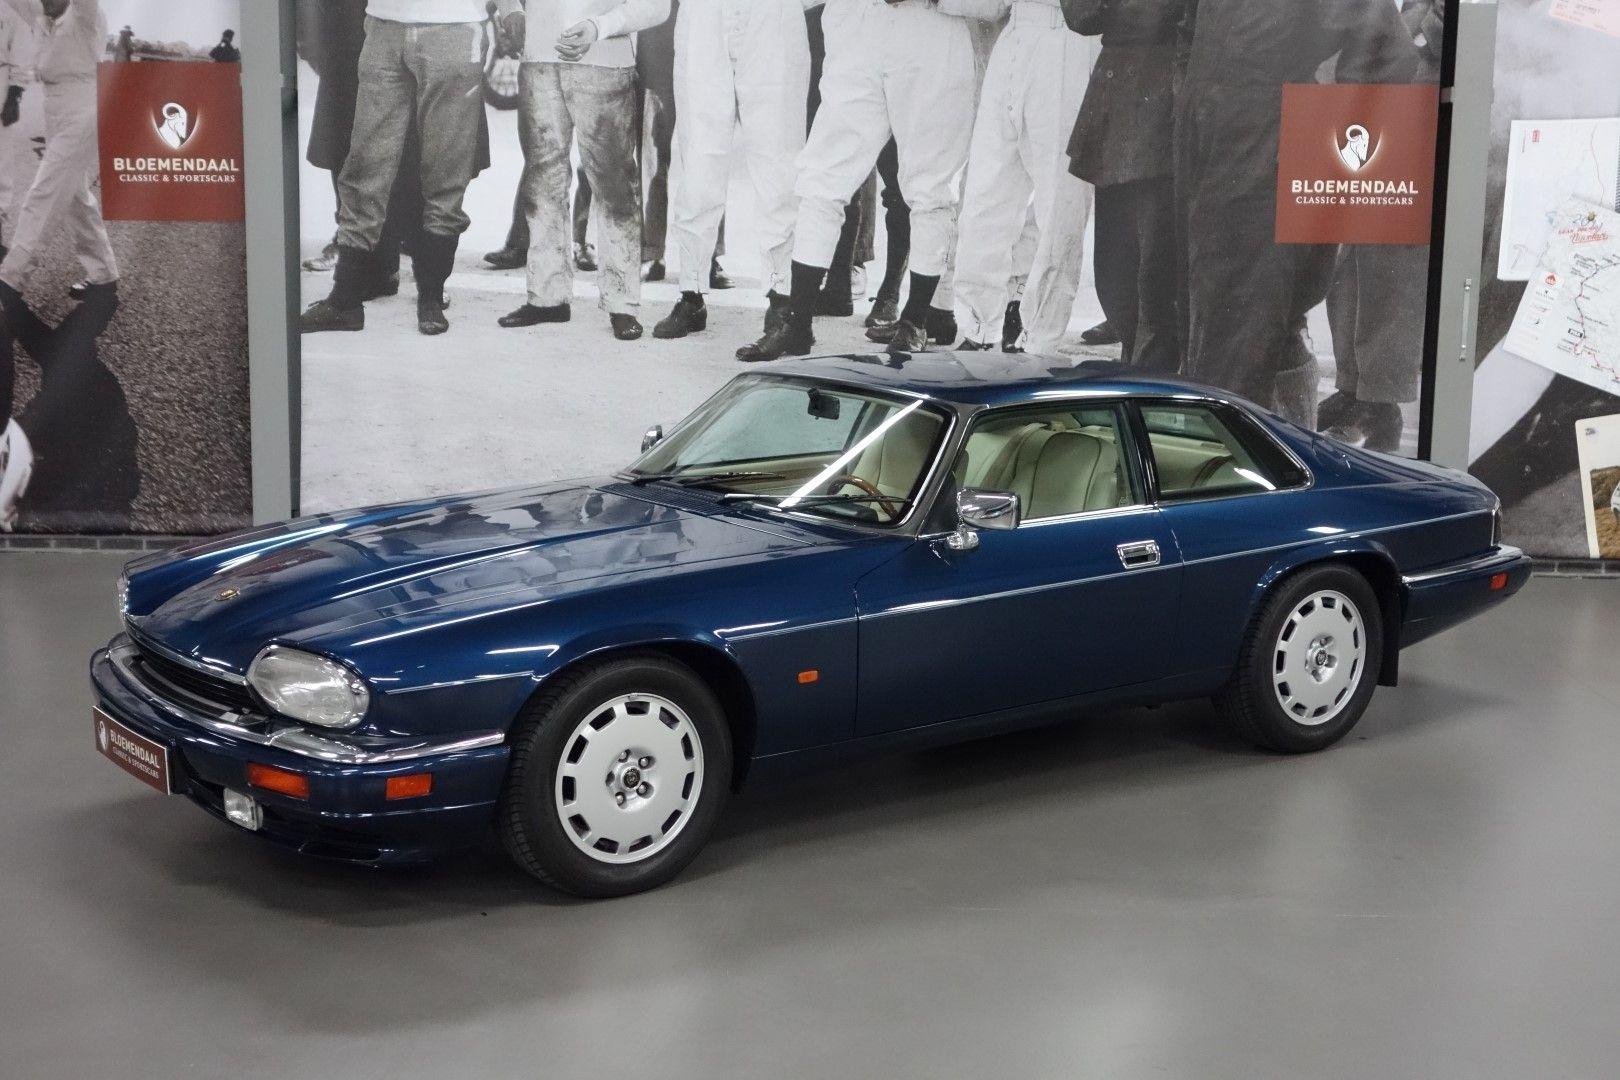 jaguar xjs coup 4 0 bloemendaal classic sportscars jaguar rh pinterest com